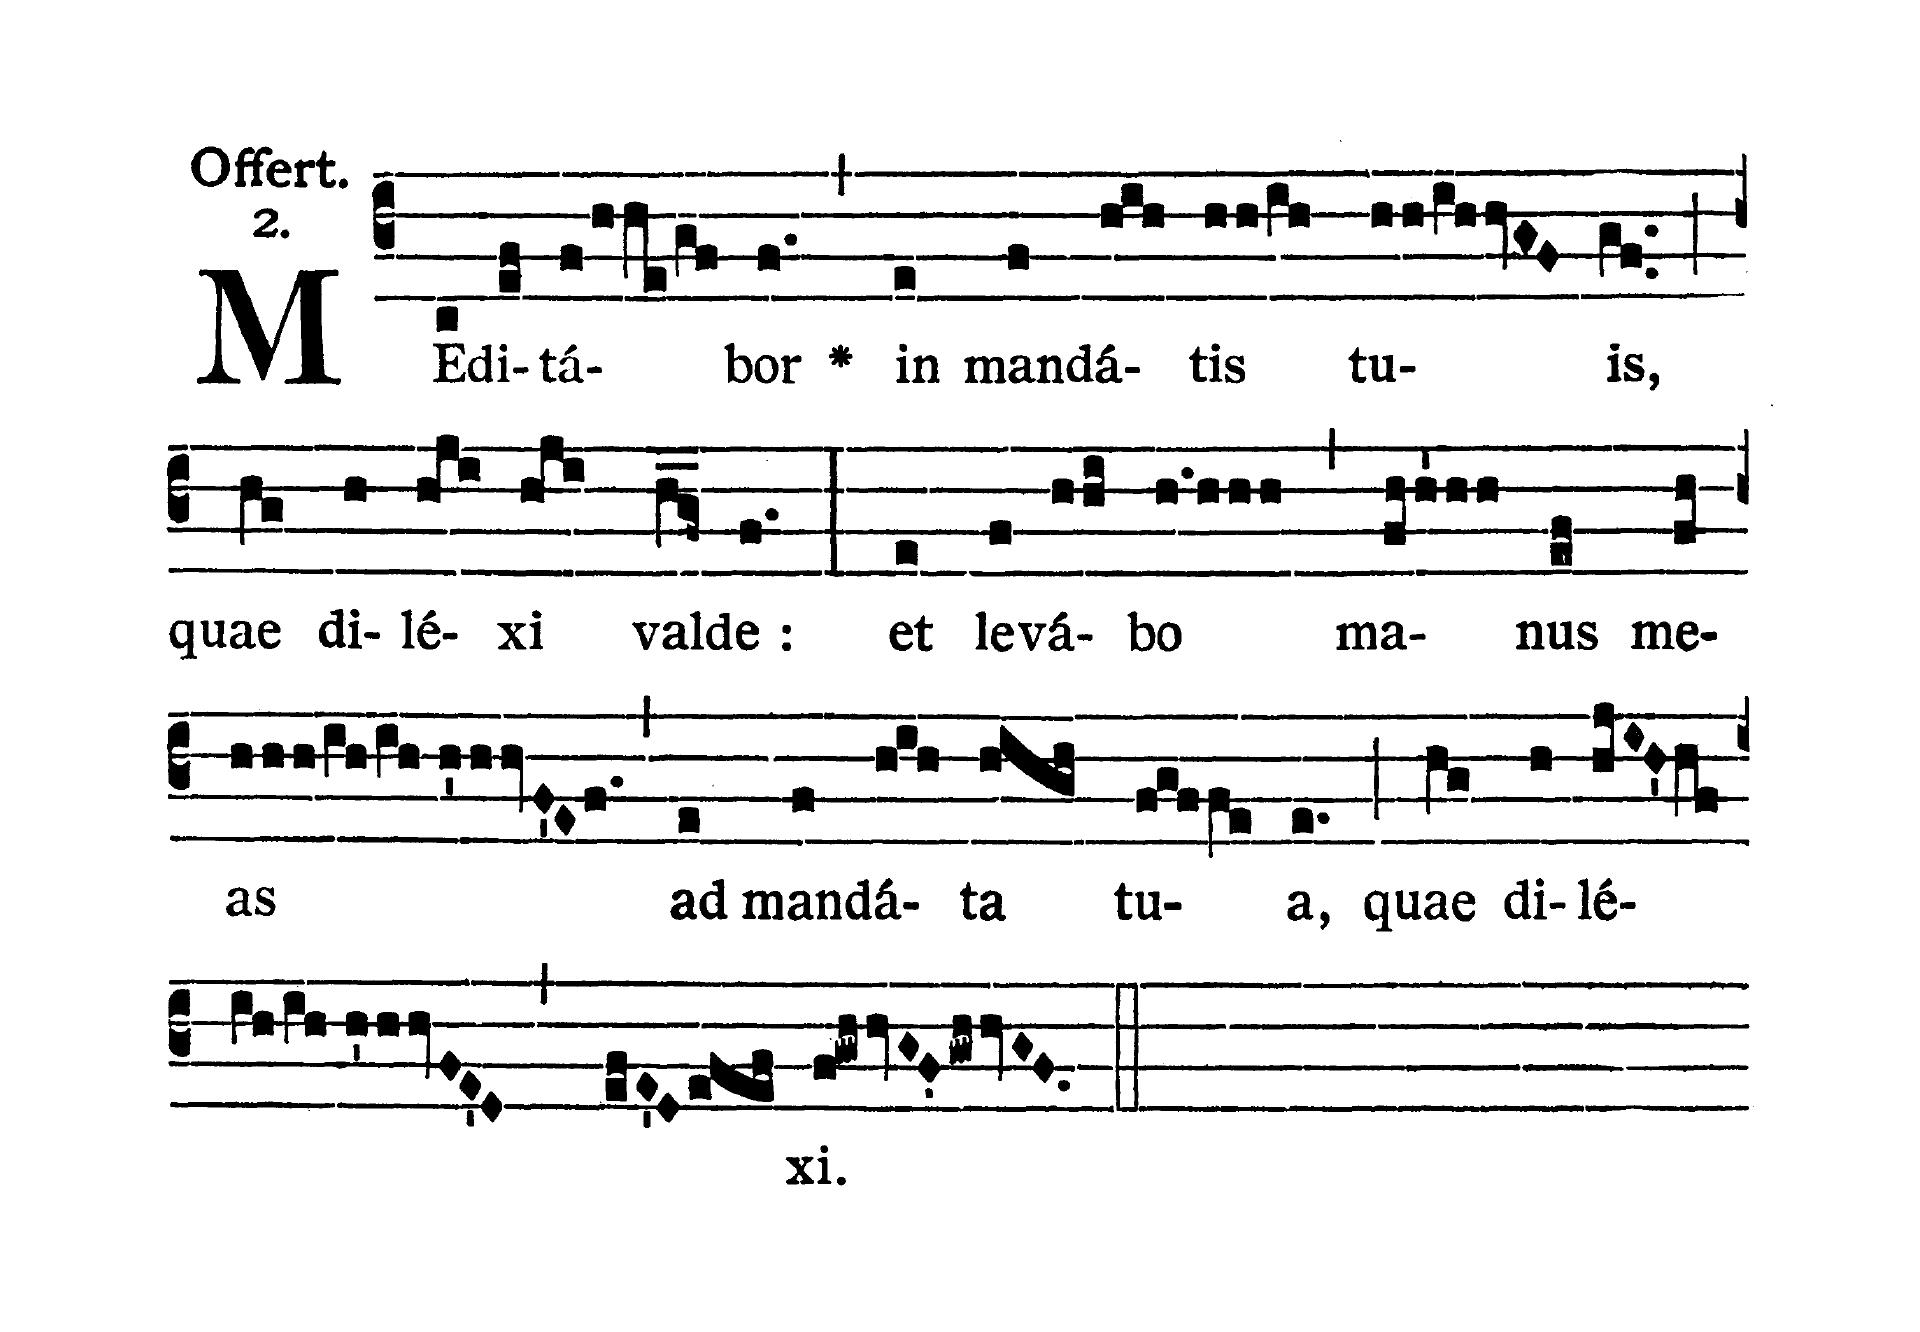 Feria VI Quatuor Temporum Septembris (Piątek suchych dni wrześniowych) - Offertorium (Benedic anima mea)